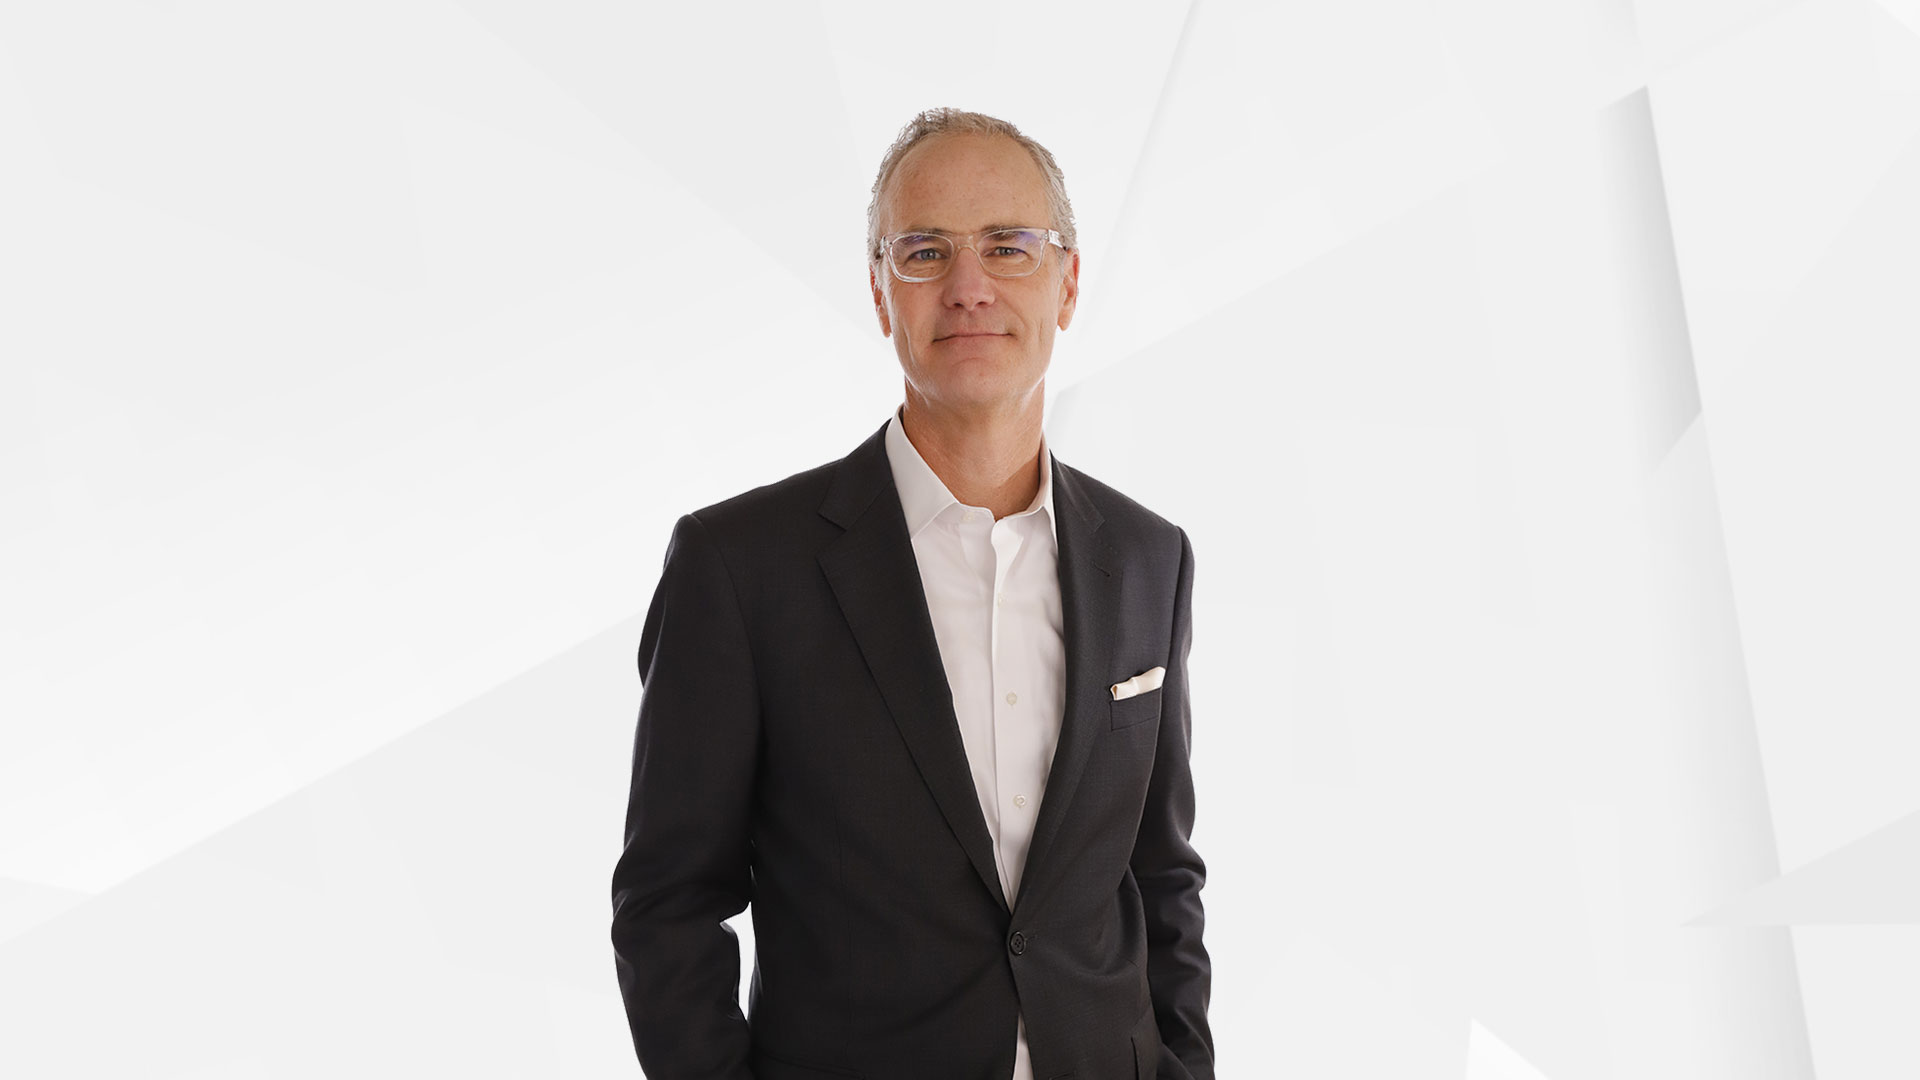 GARY R. KOHL - CEO